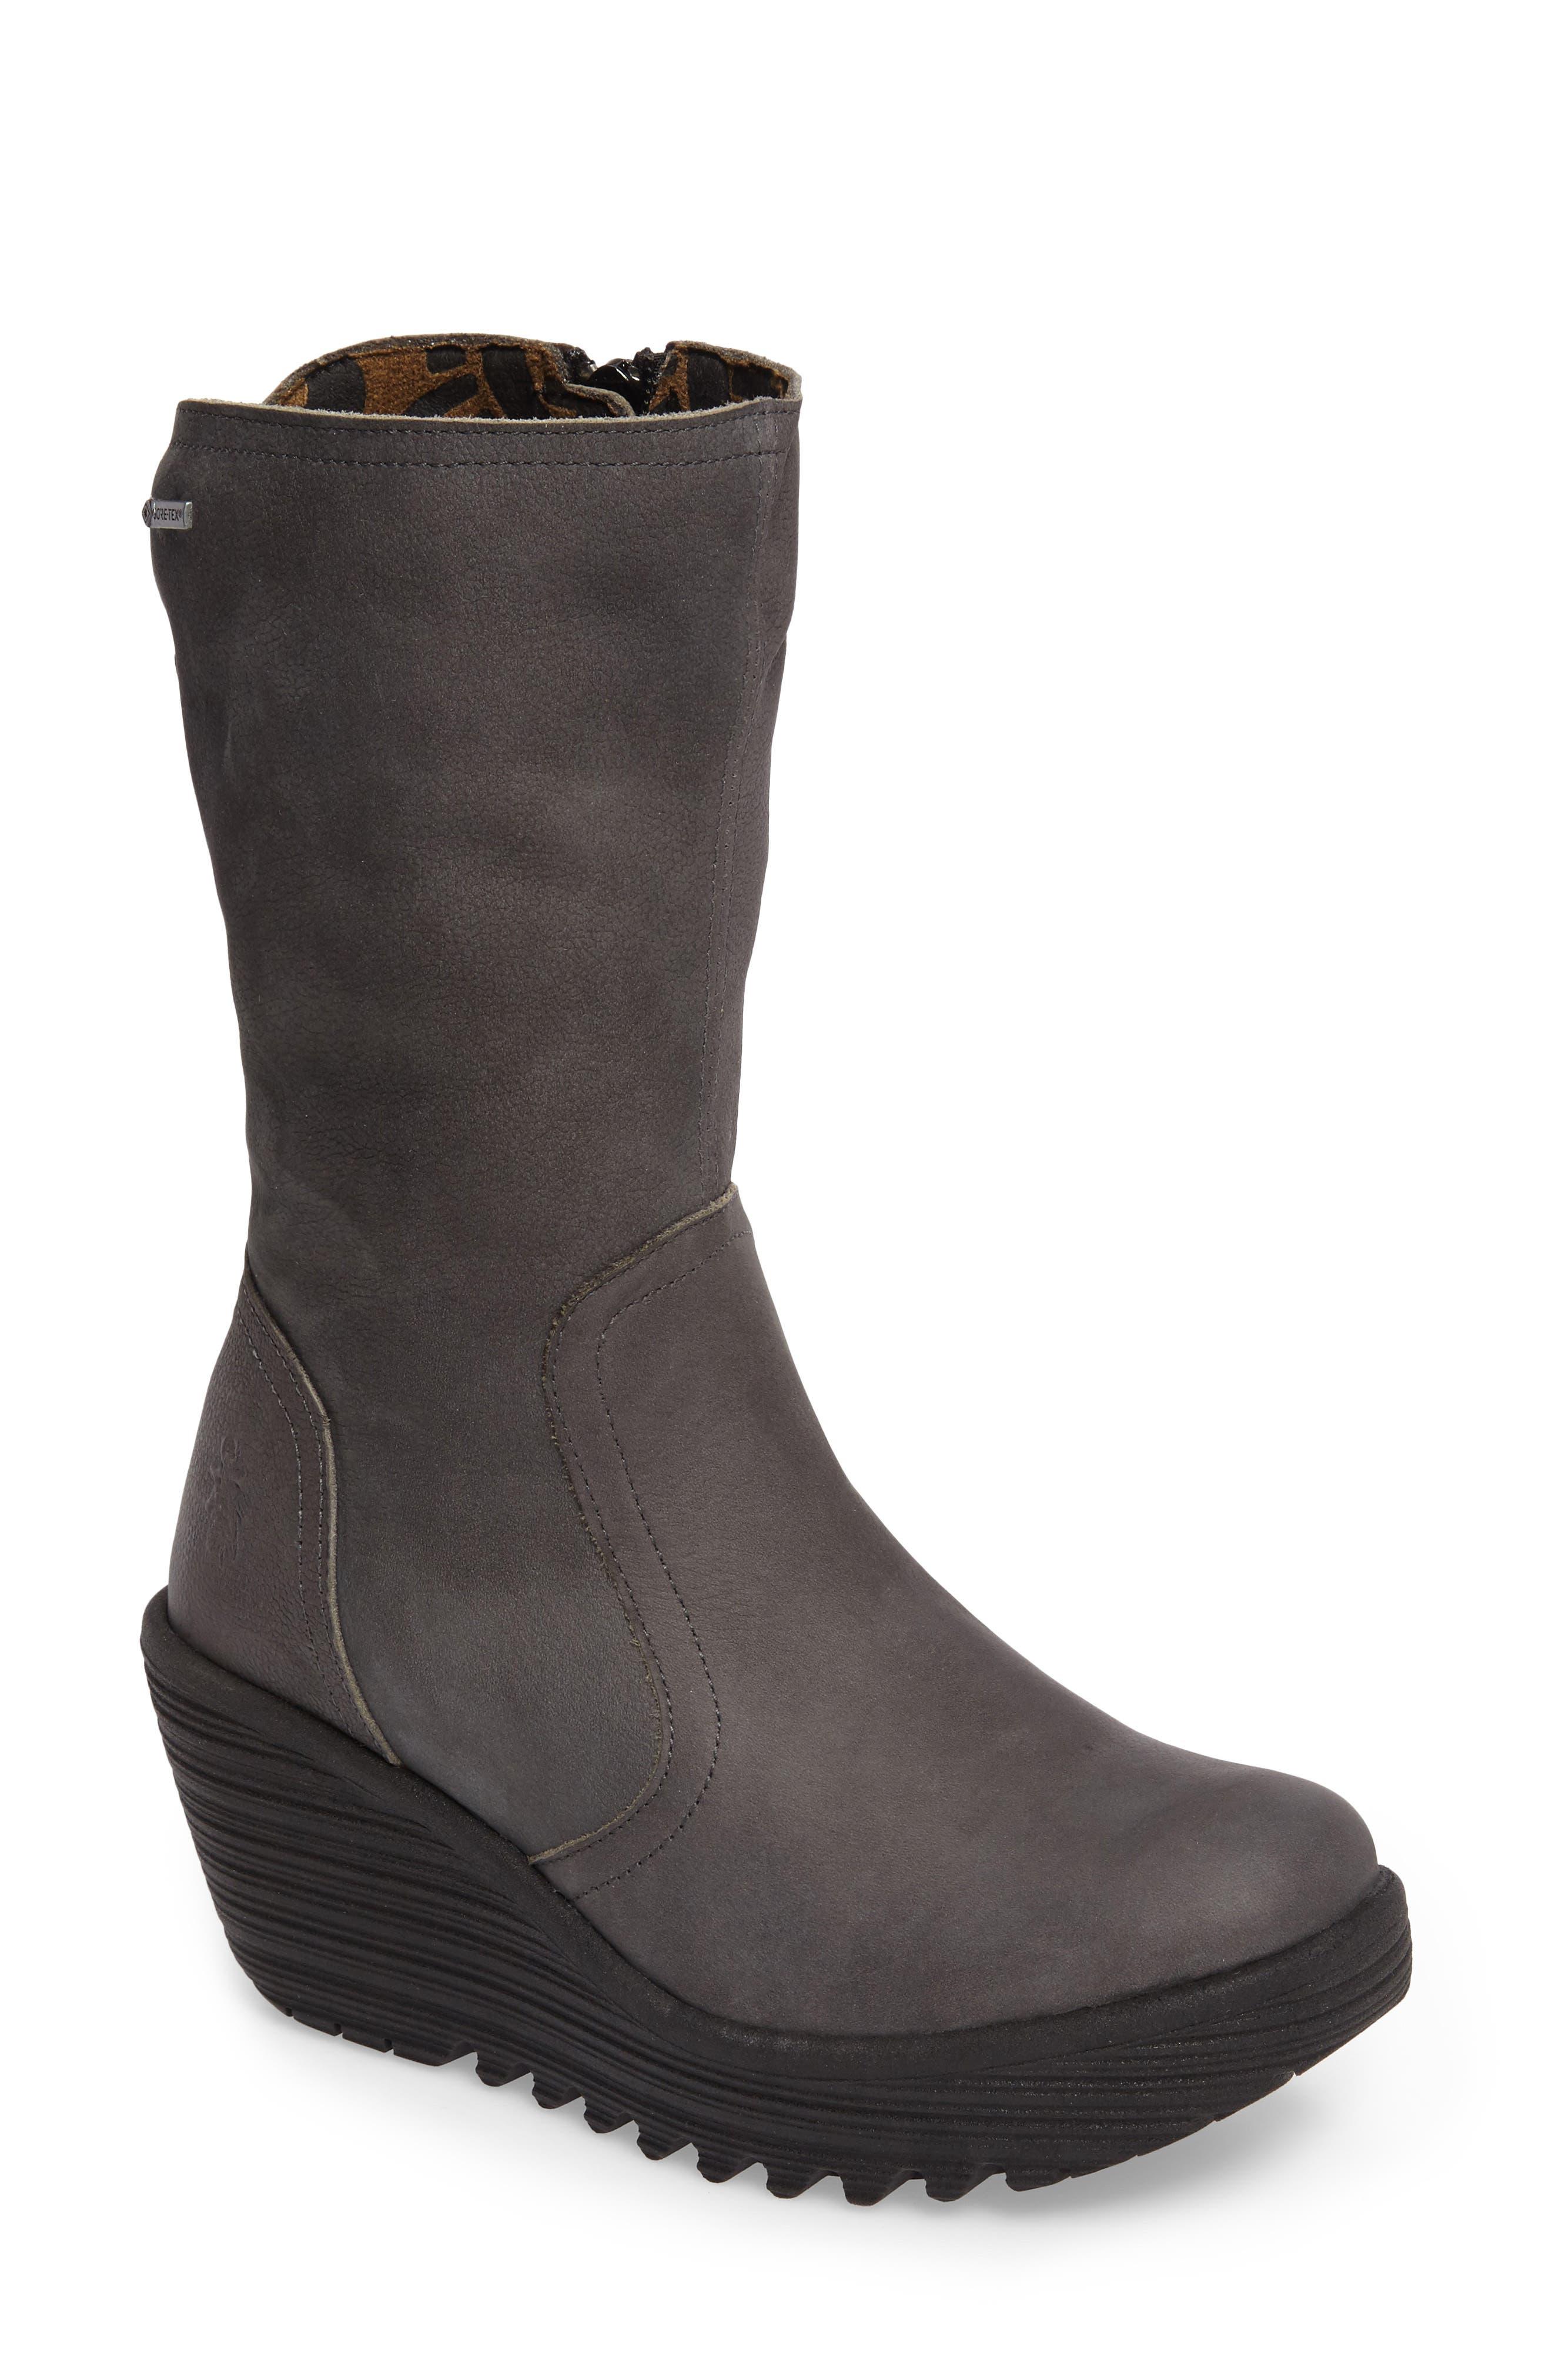 Main Image - Fly London Yups Waterproof Gore-Tex® Wedge Boot (Women)